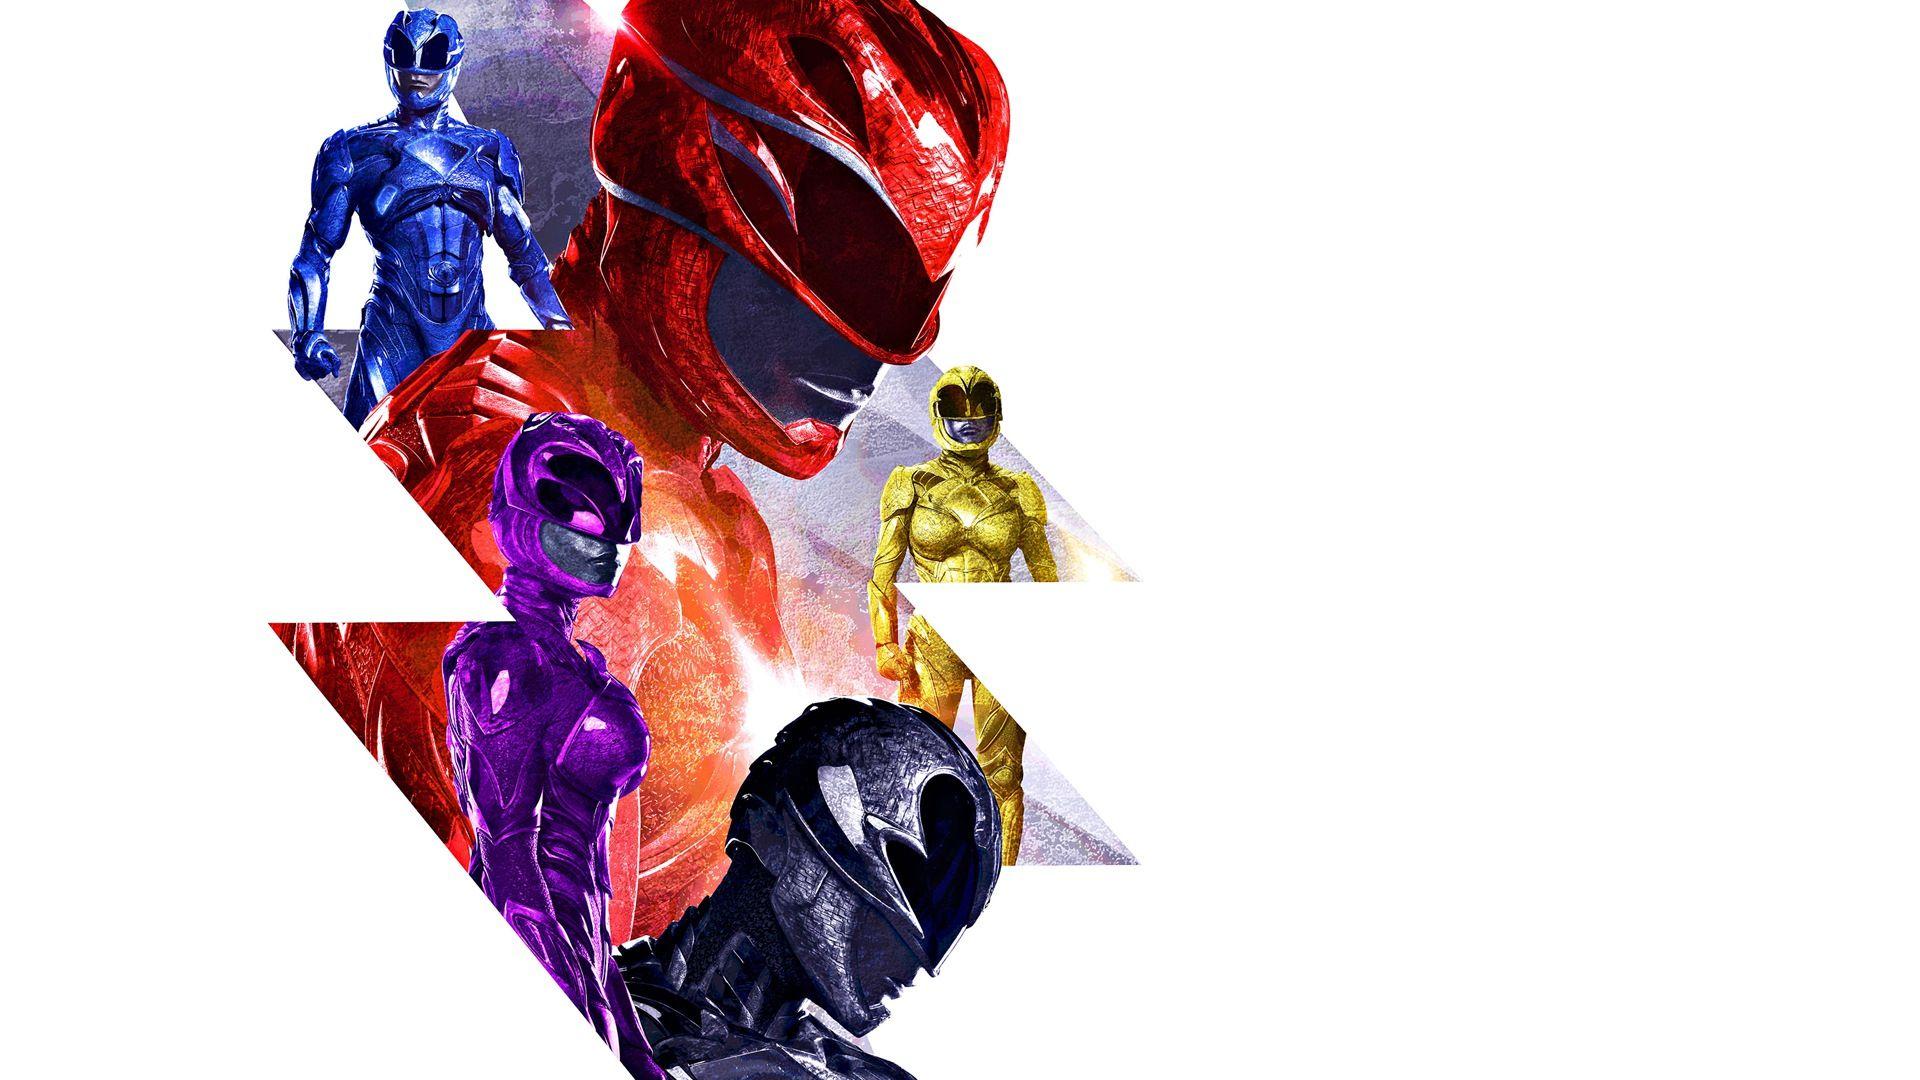 Download Power Rangers 2017 Wallpaper HD Backgrounds Download 1920x1080